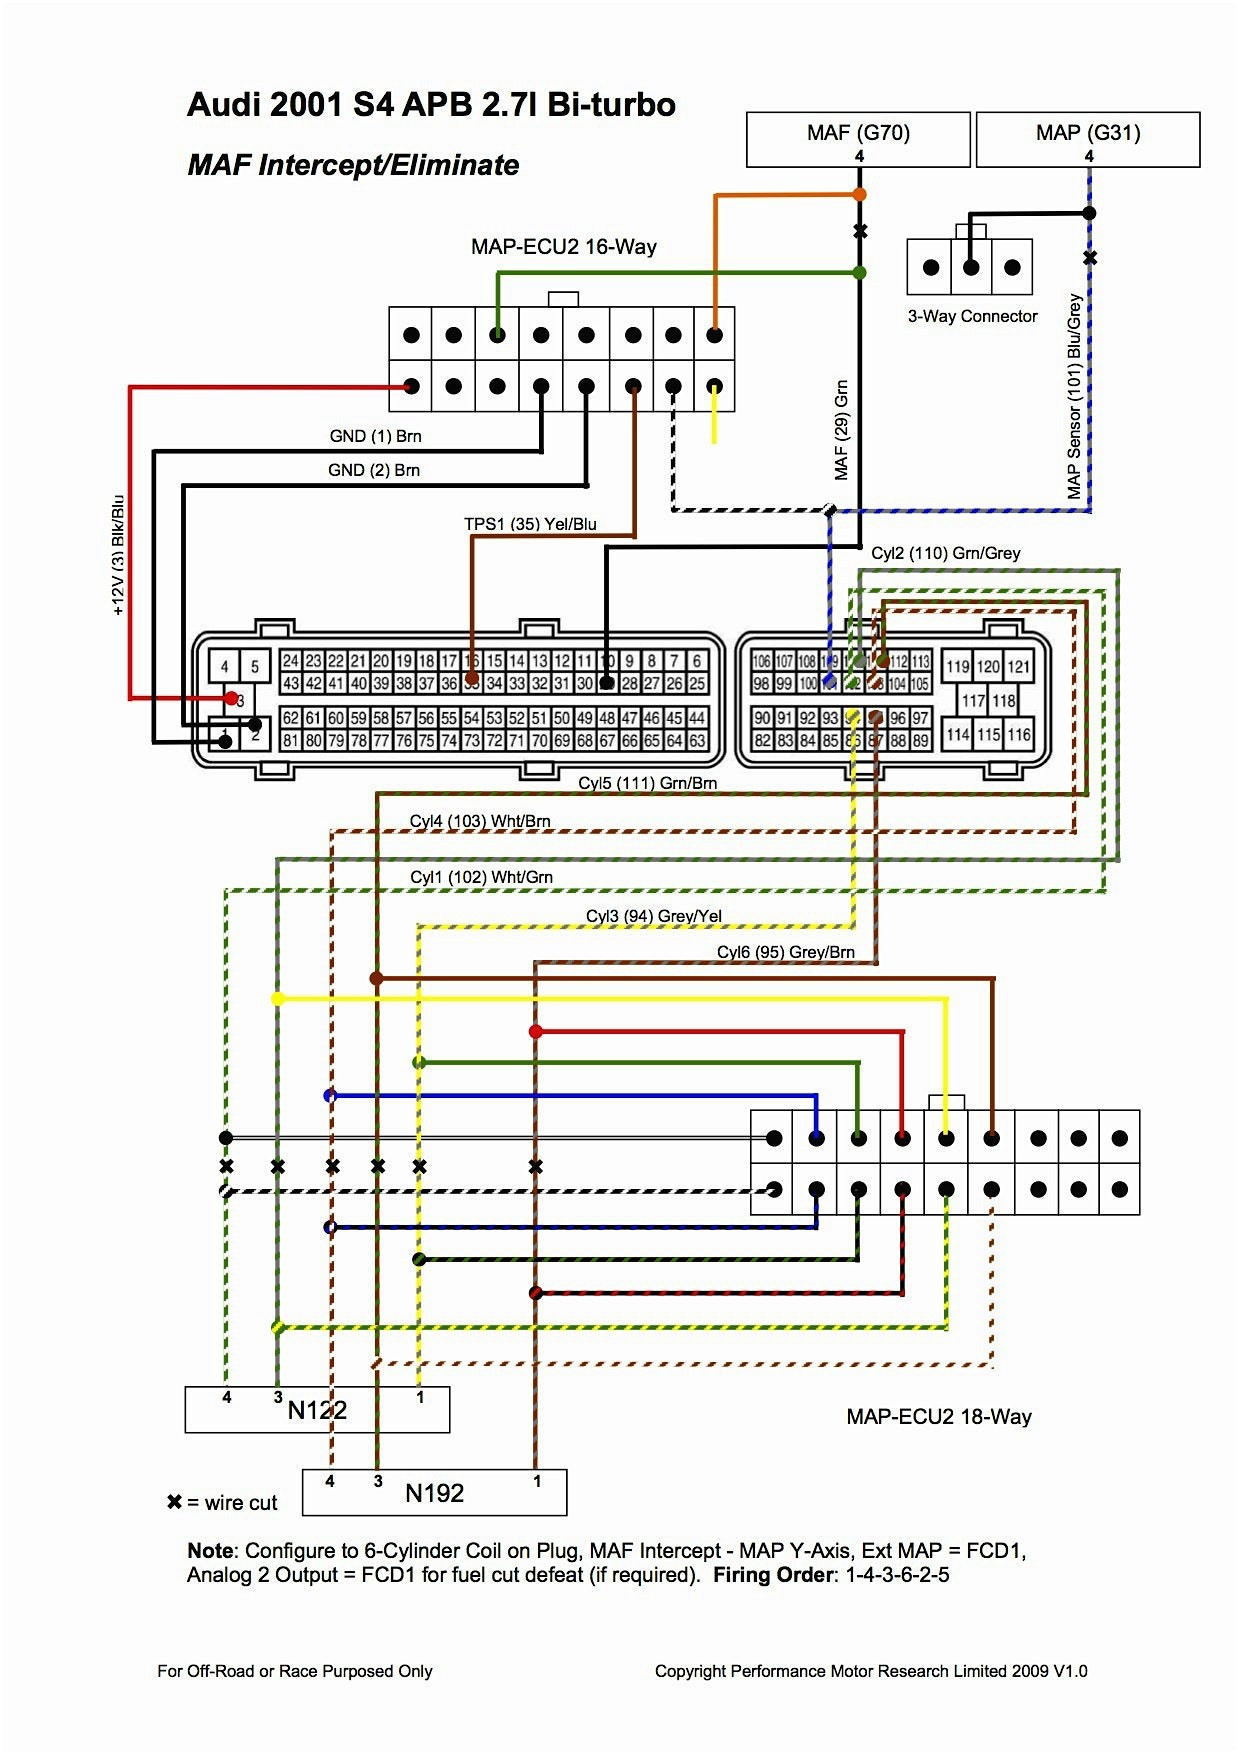 Vw Passat Engine Diagram 1999 Jetta Radio Wiring Diagram Worksheet and Wiring Diagram • Of Vw Passat Engine Diagram